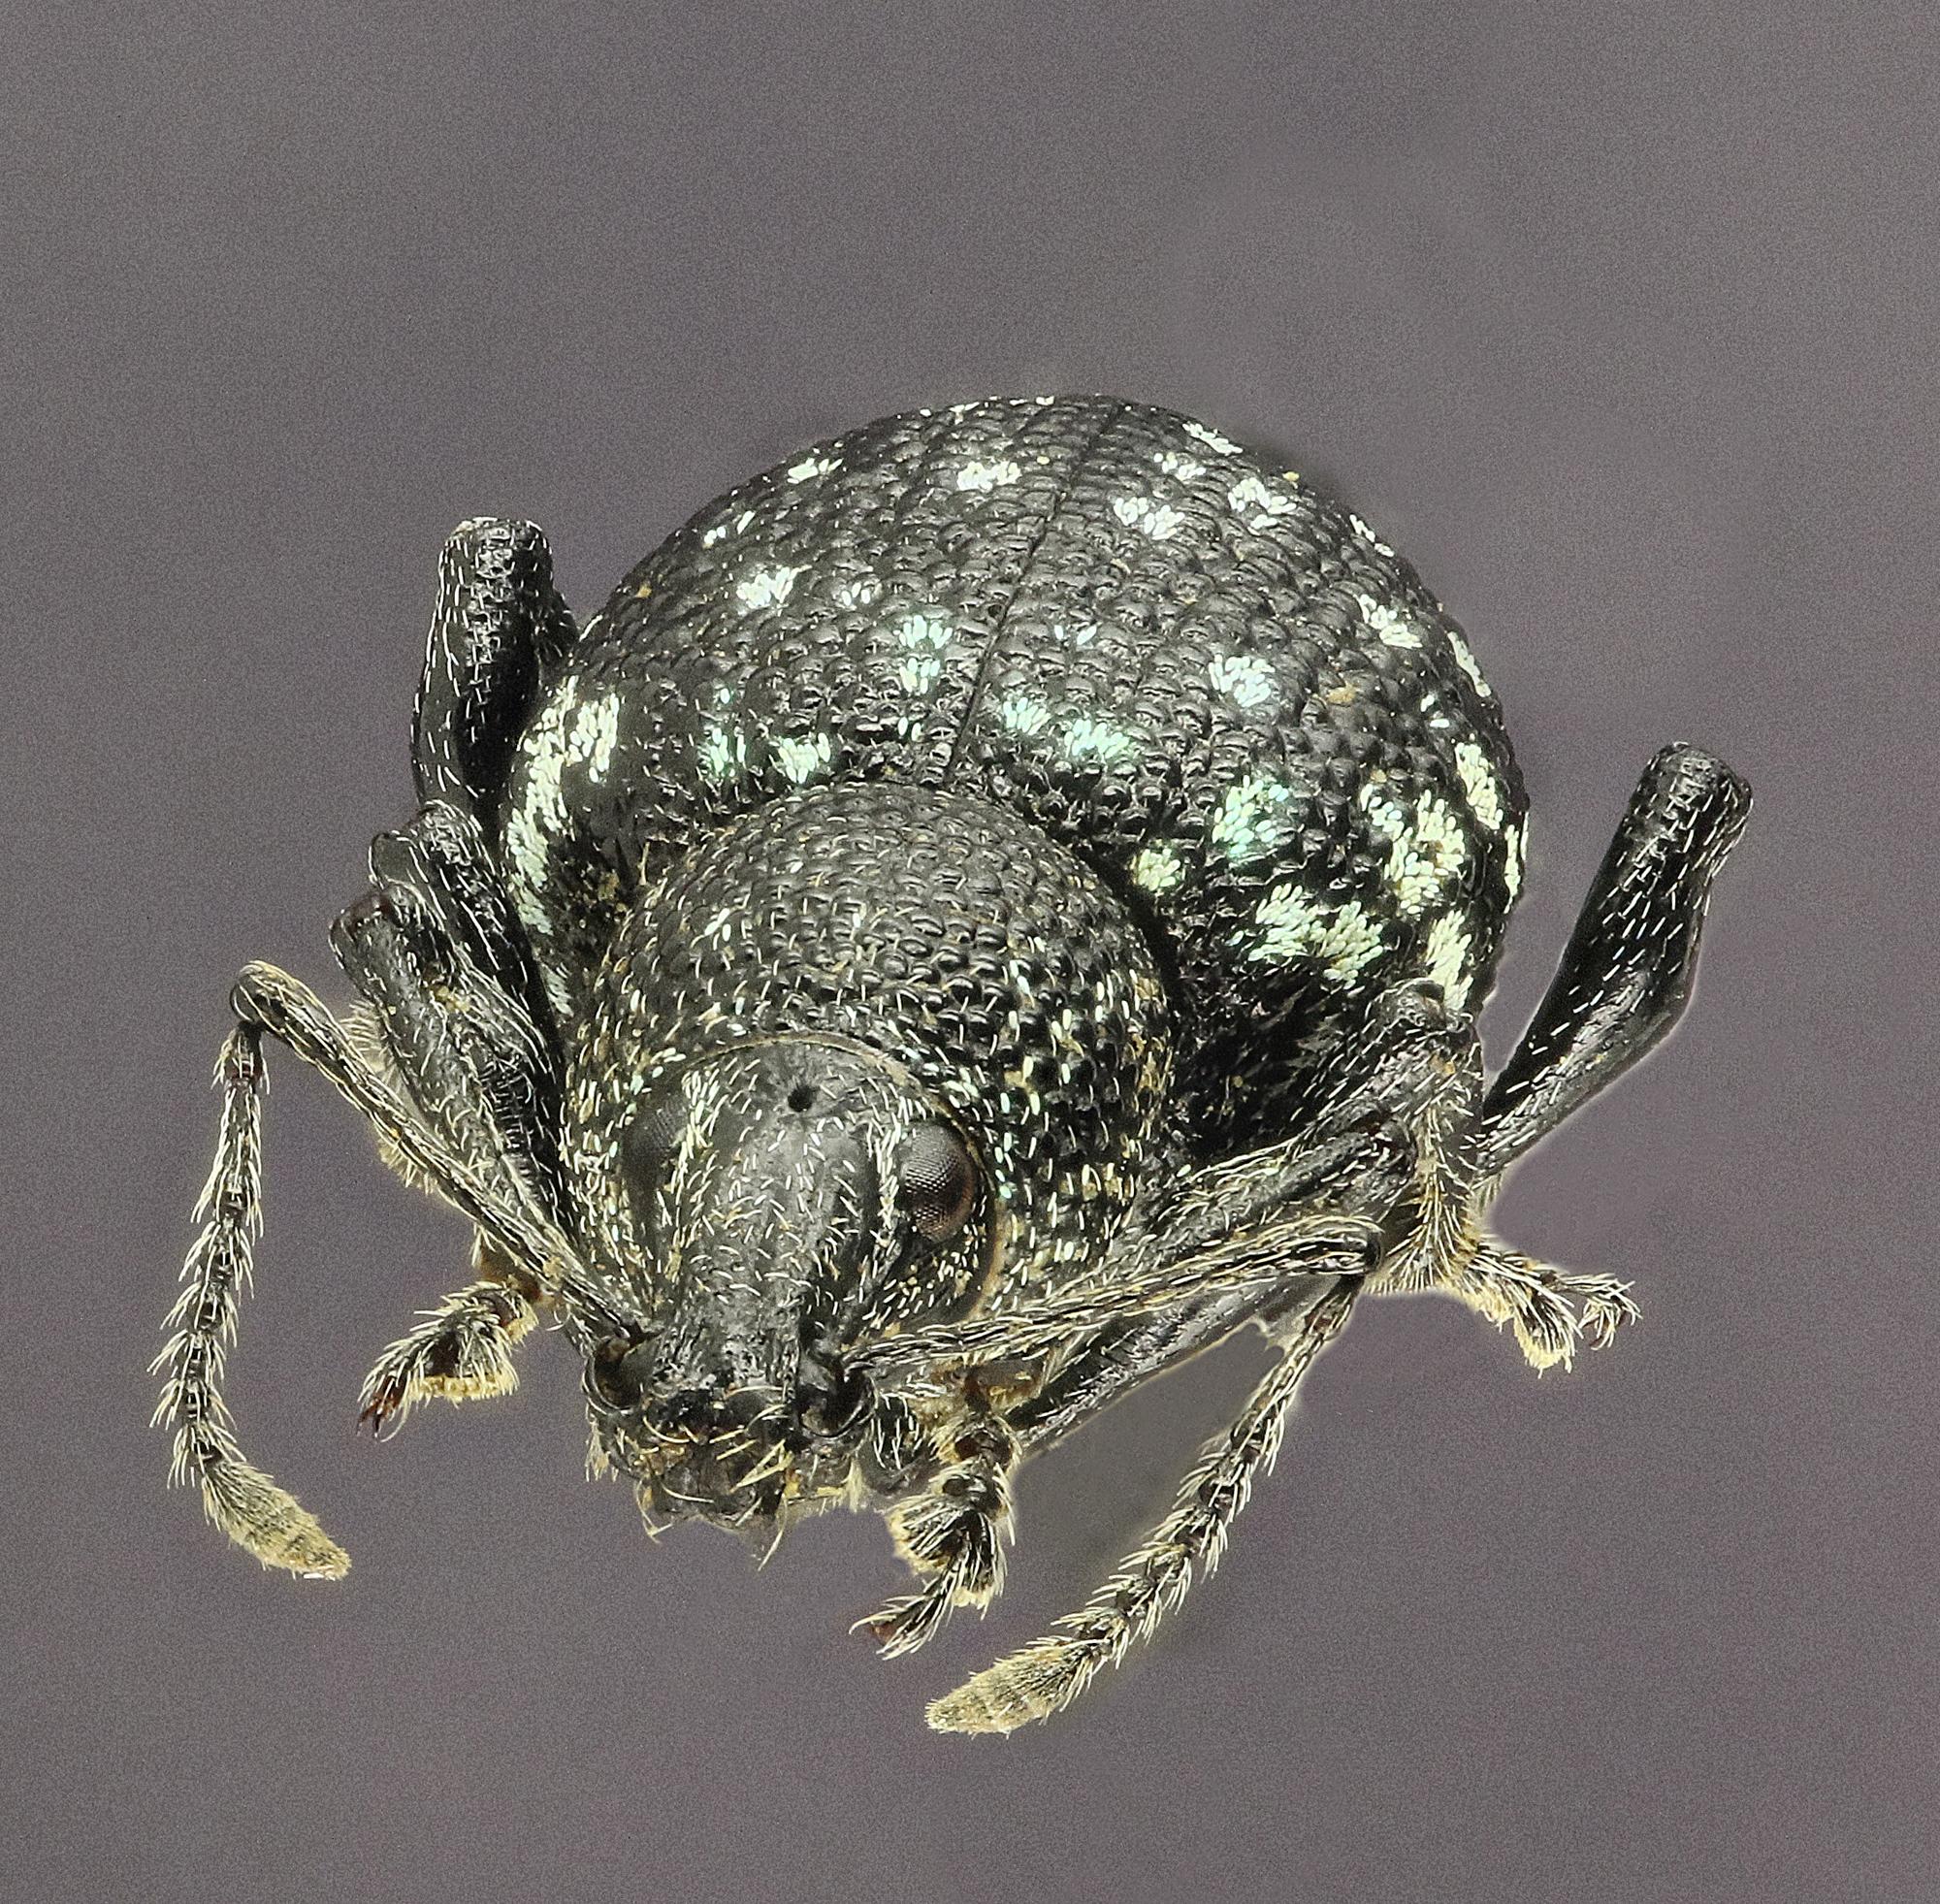 Otiorhynchus (Prilisvanus) gemmatus EOS 70D 7848cz74.jpg